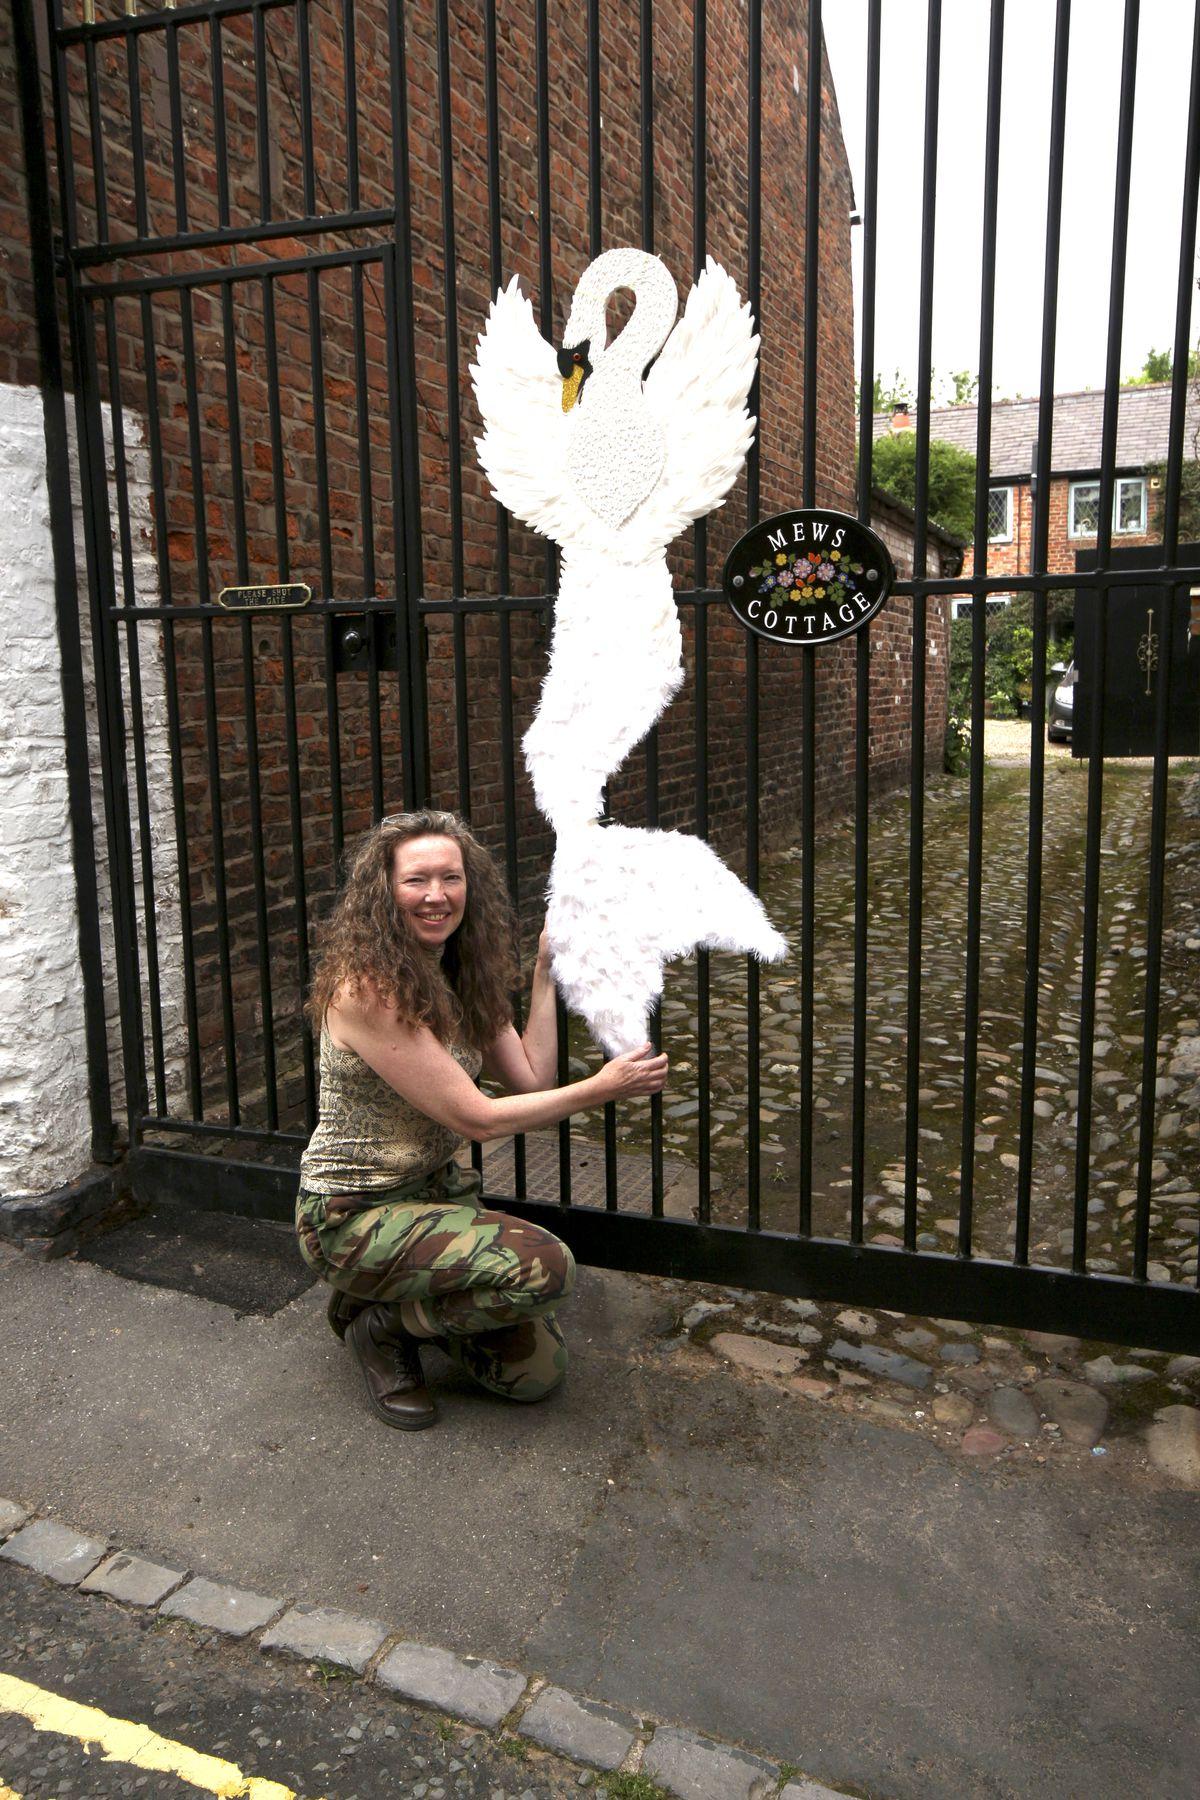 Sally Poynton with her figure. Photo: David Atkinson